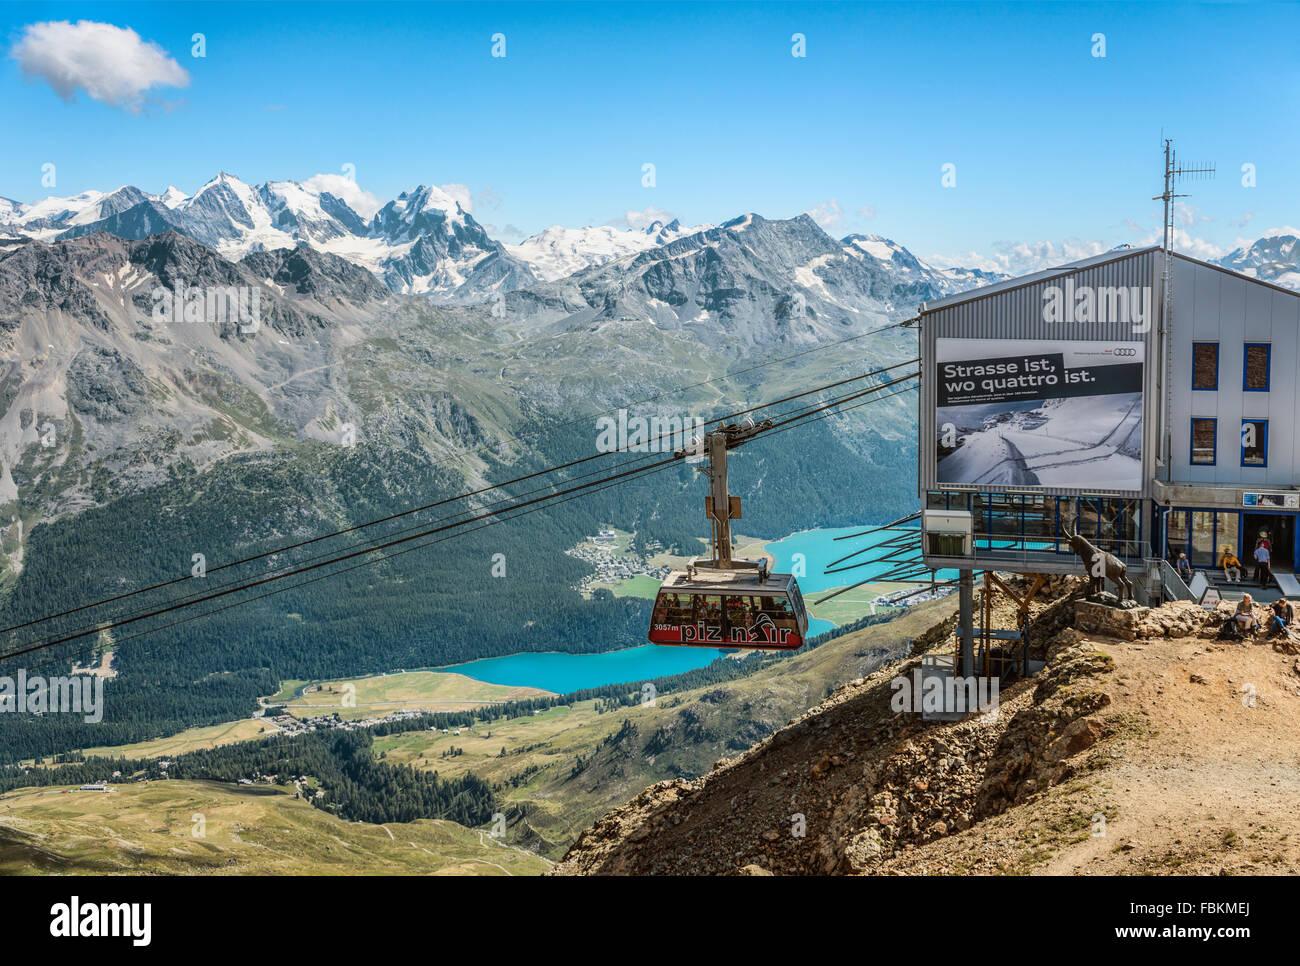 Piz Nair Funicular, St.Moritz, Grisons, Switzerland   Piz Nair Seilbahn, St.Moritz, Schweiz - Stock Image